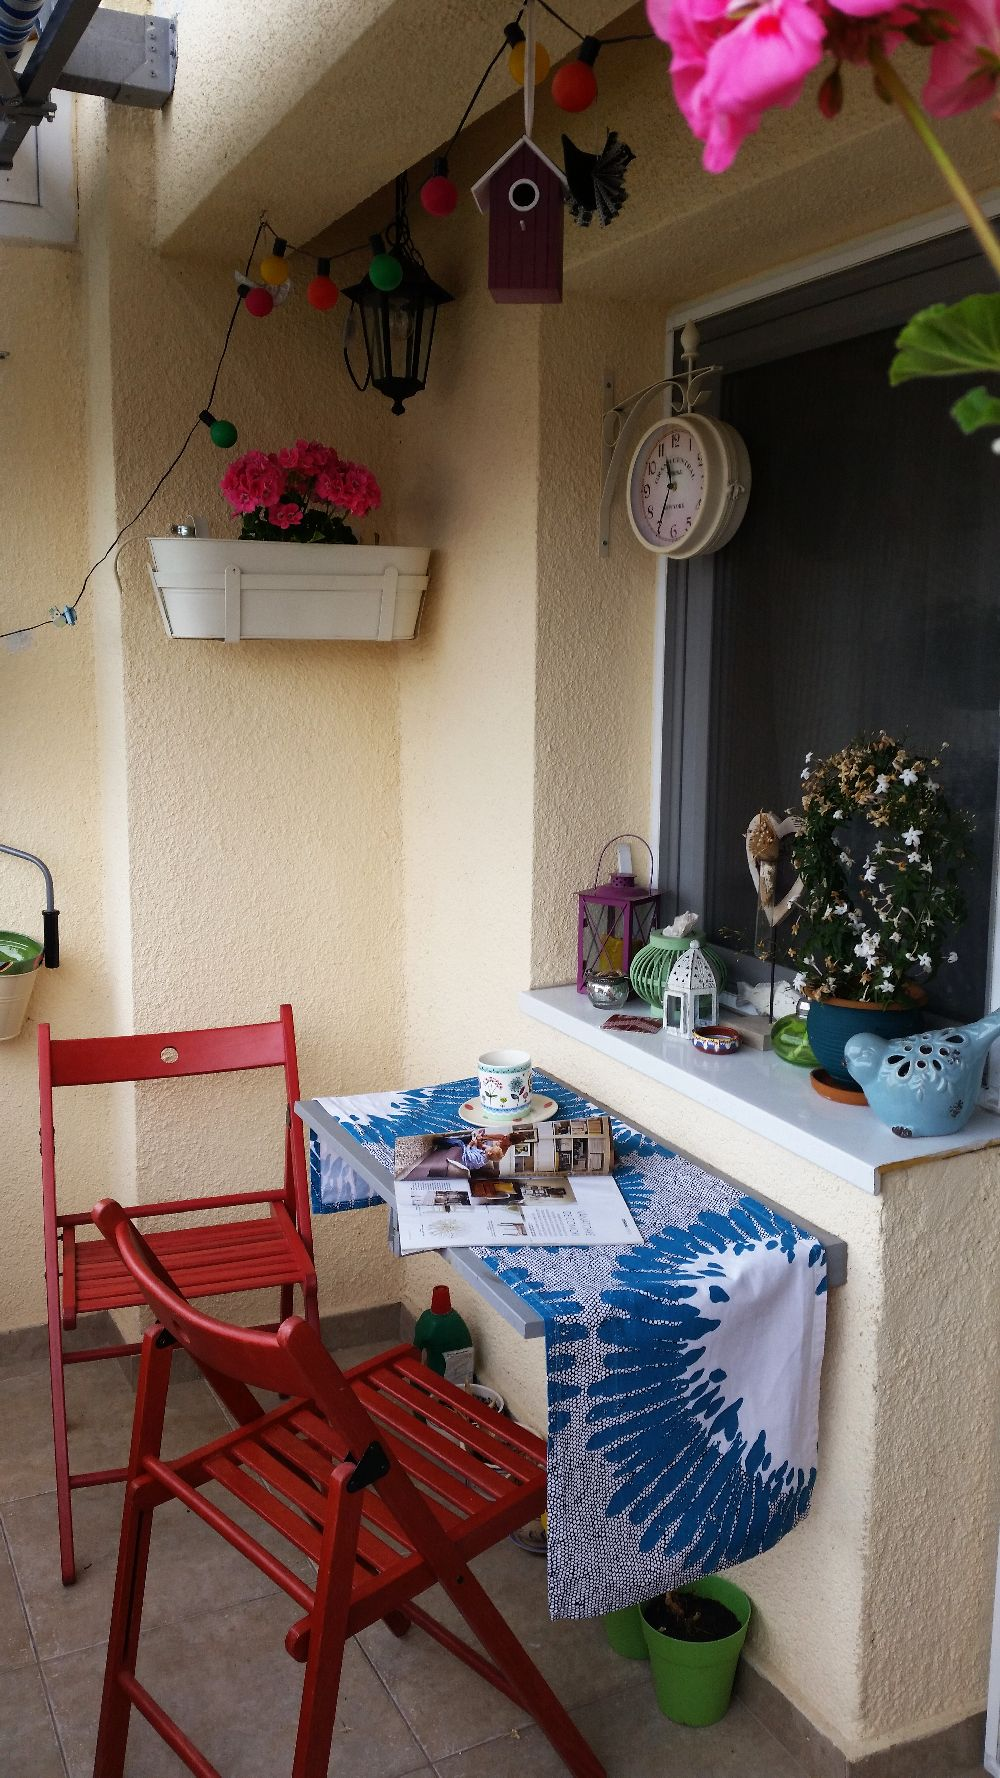 adelaparvu.com despre apartament 3 camere colorat in Sibiu, Foto Adela Parvu (37)